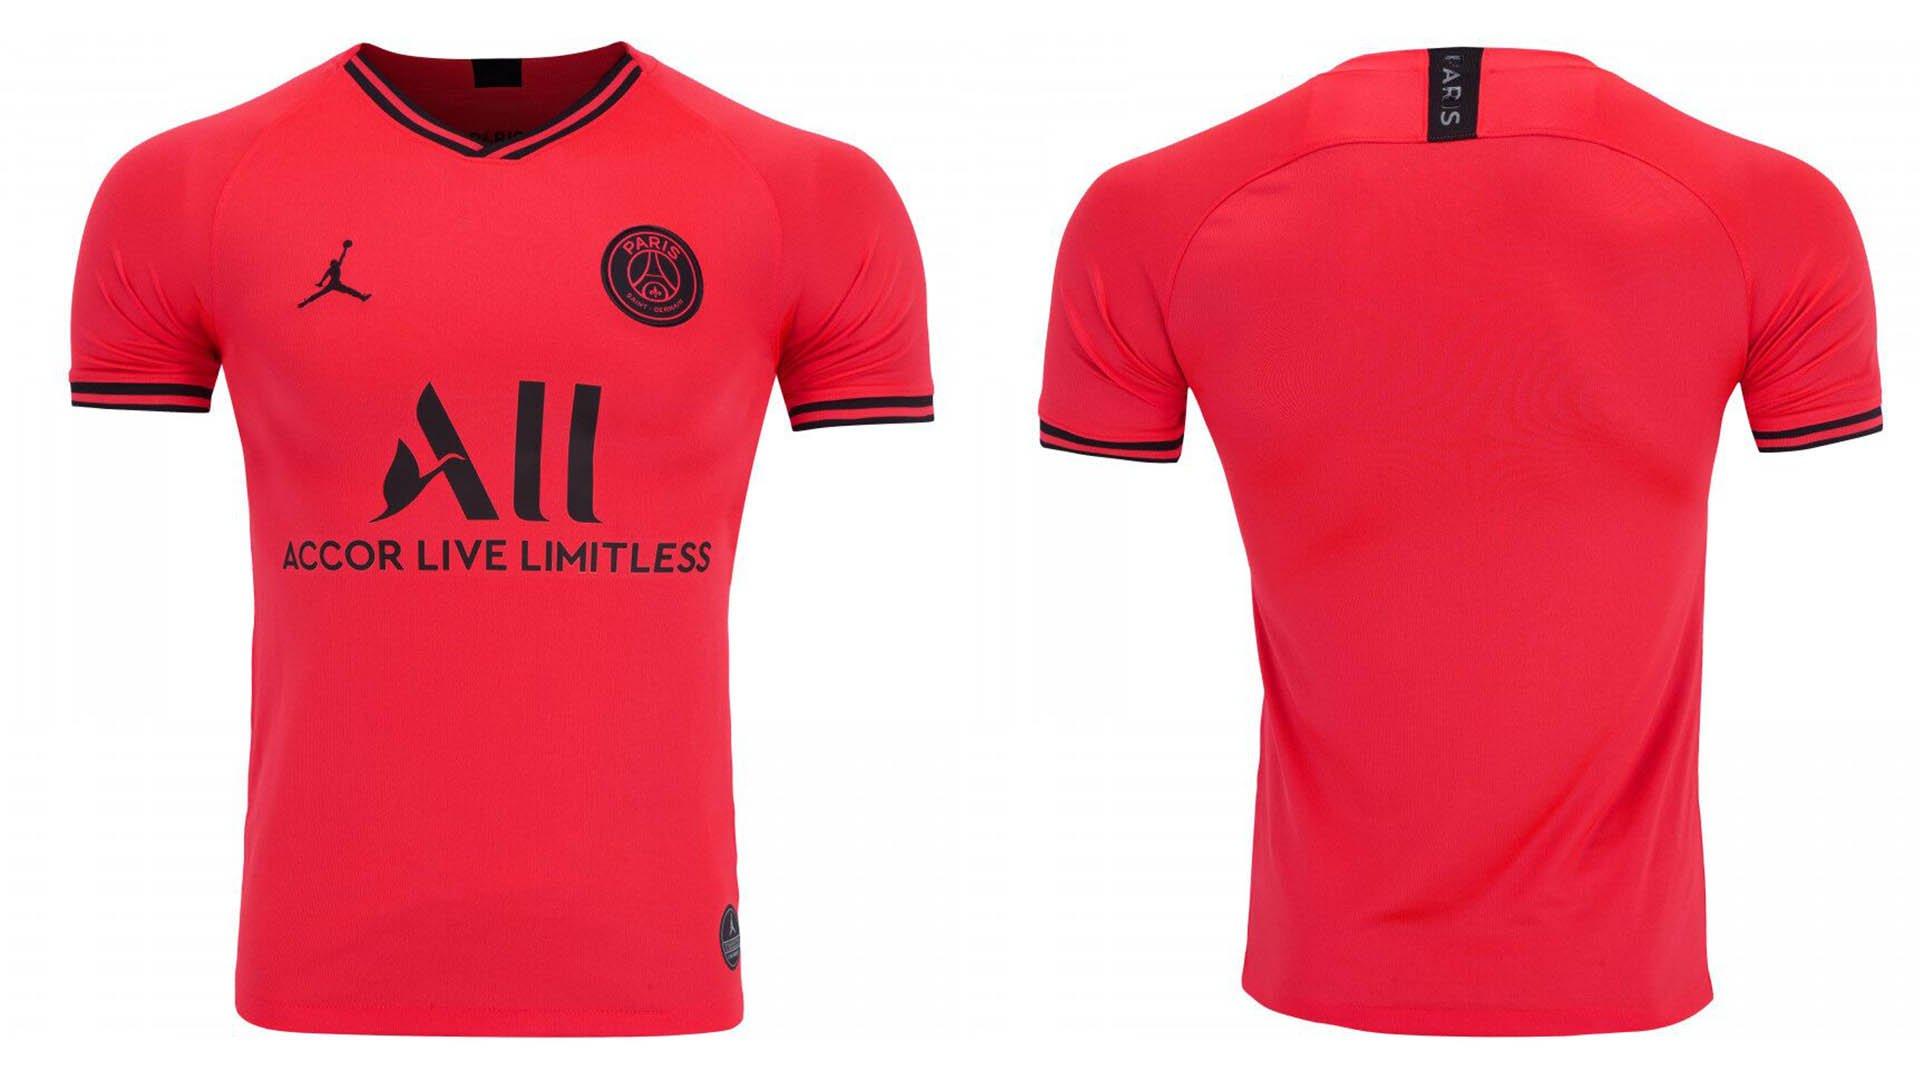 uniforme reserva psg 2019 20